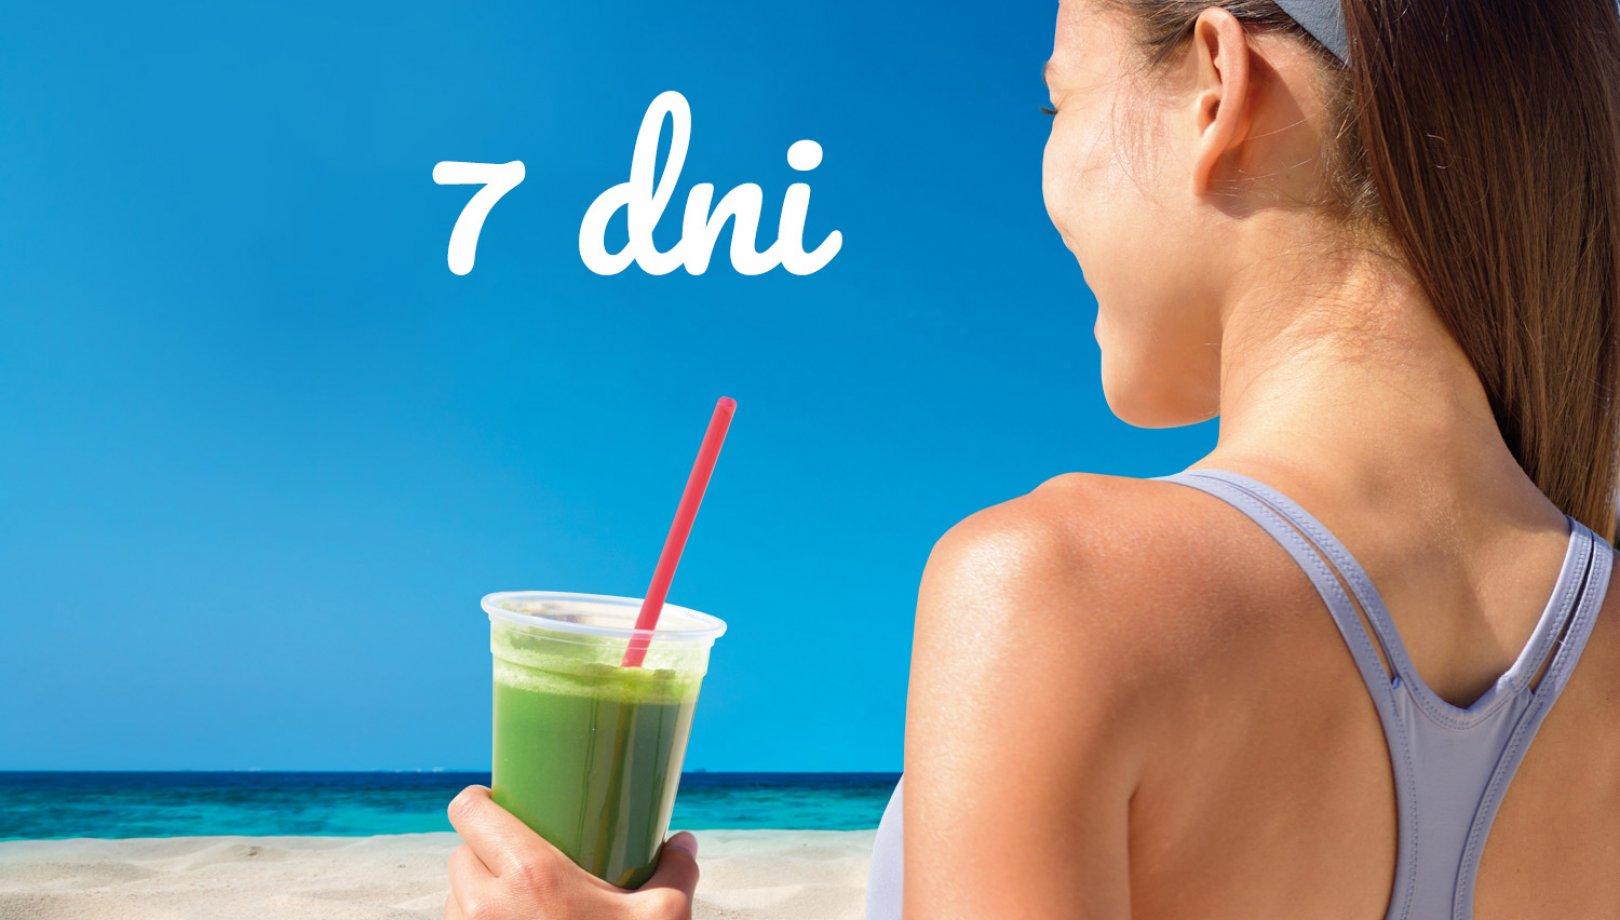 Detoxing holidays at the seaside - 7 days